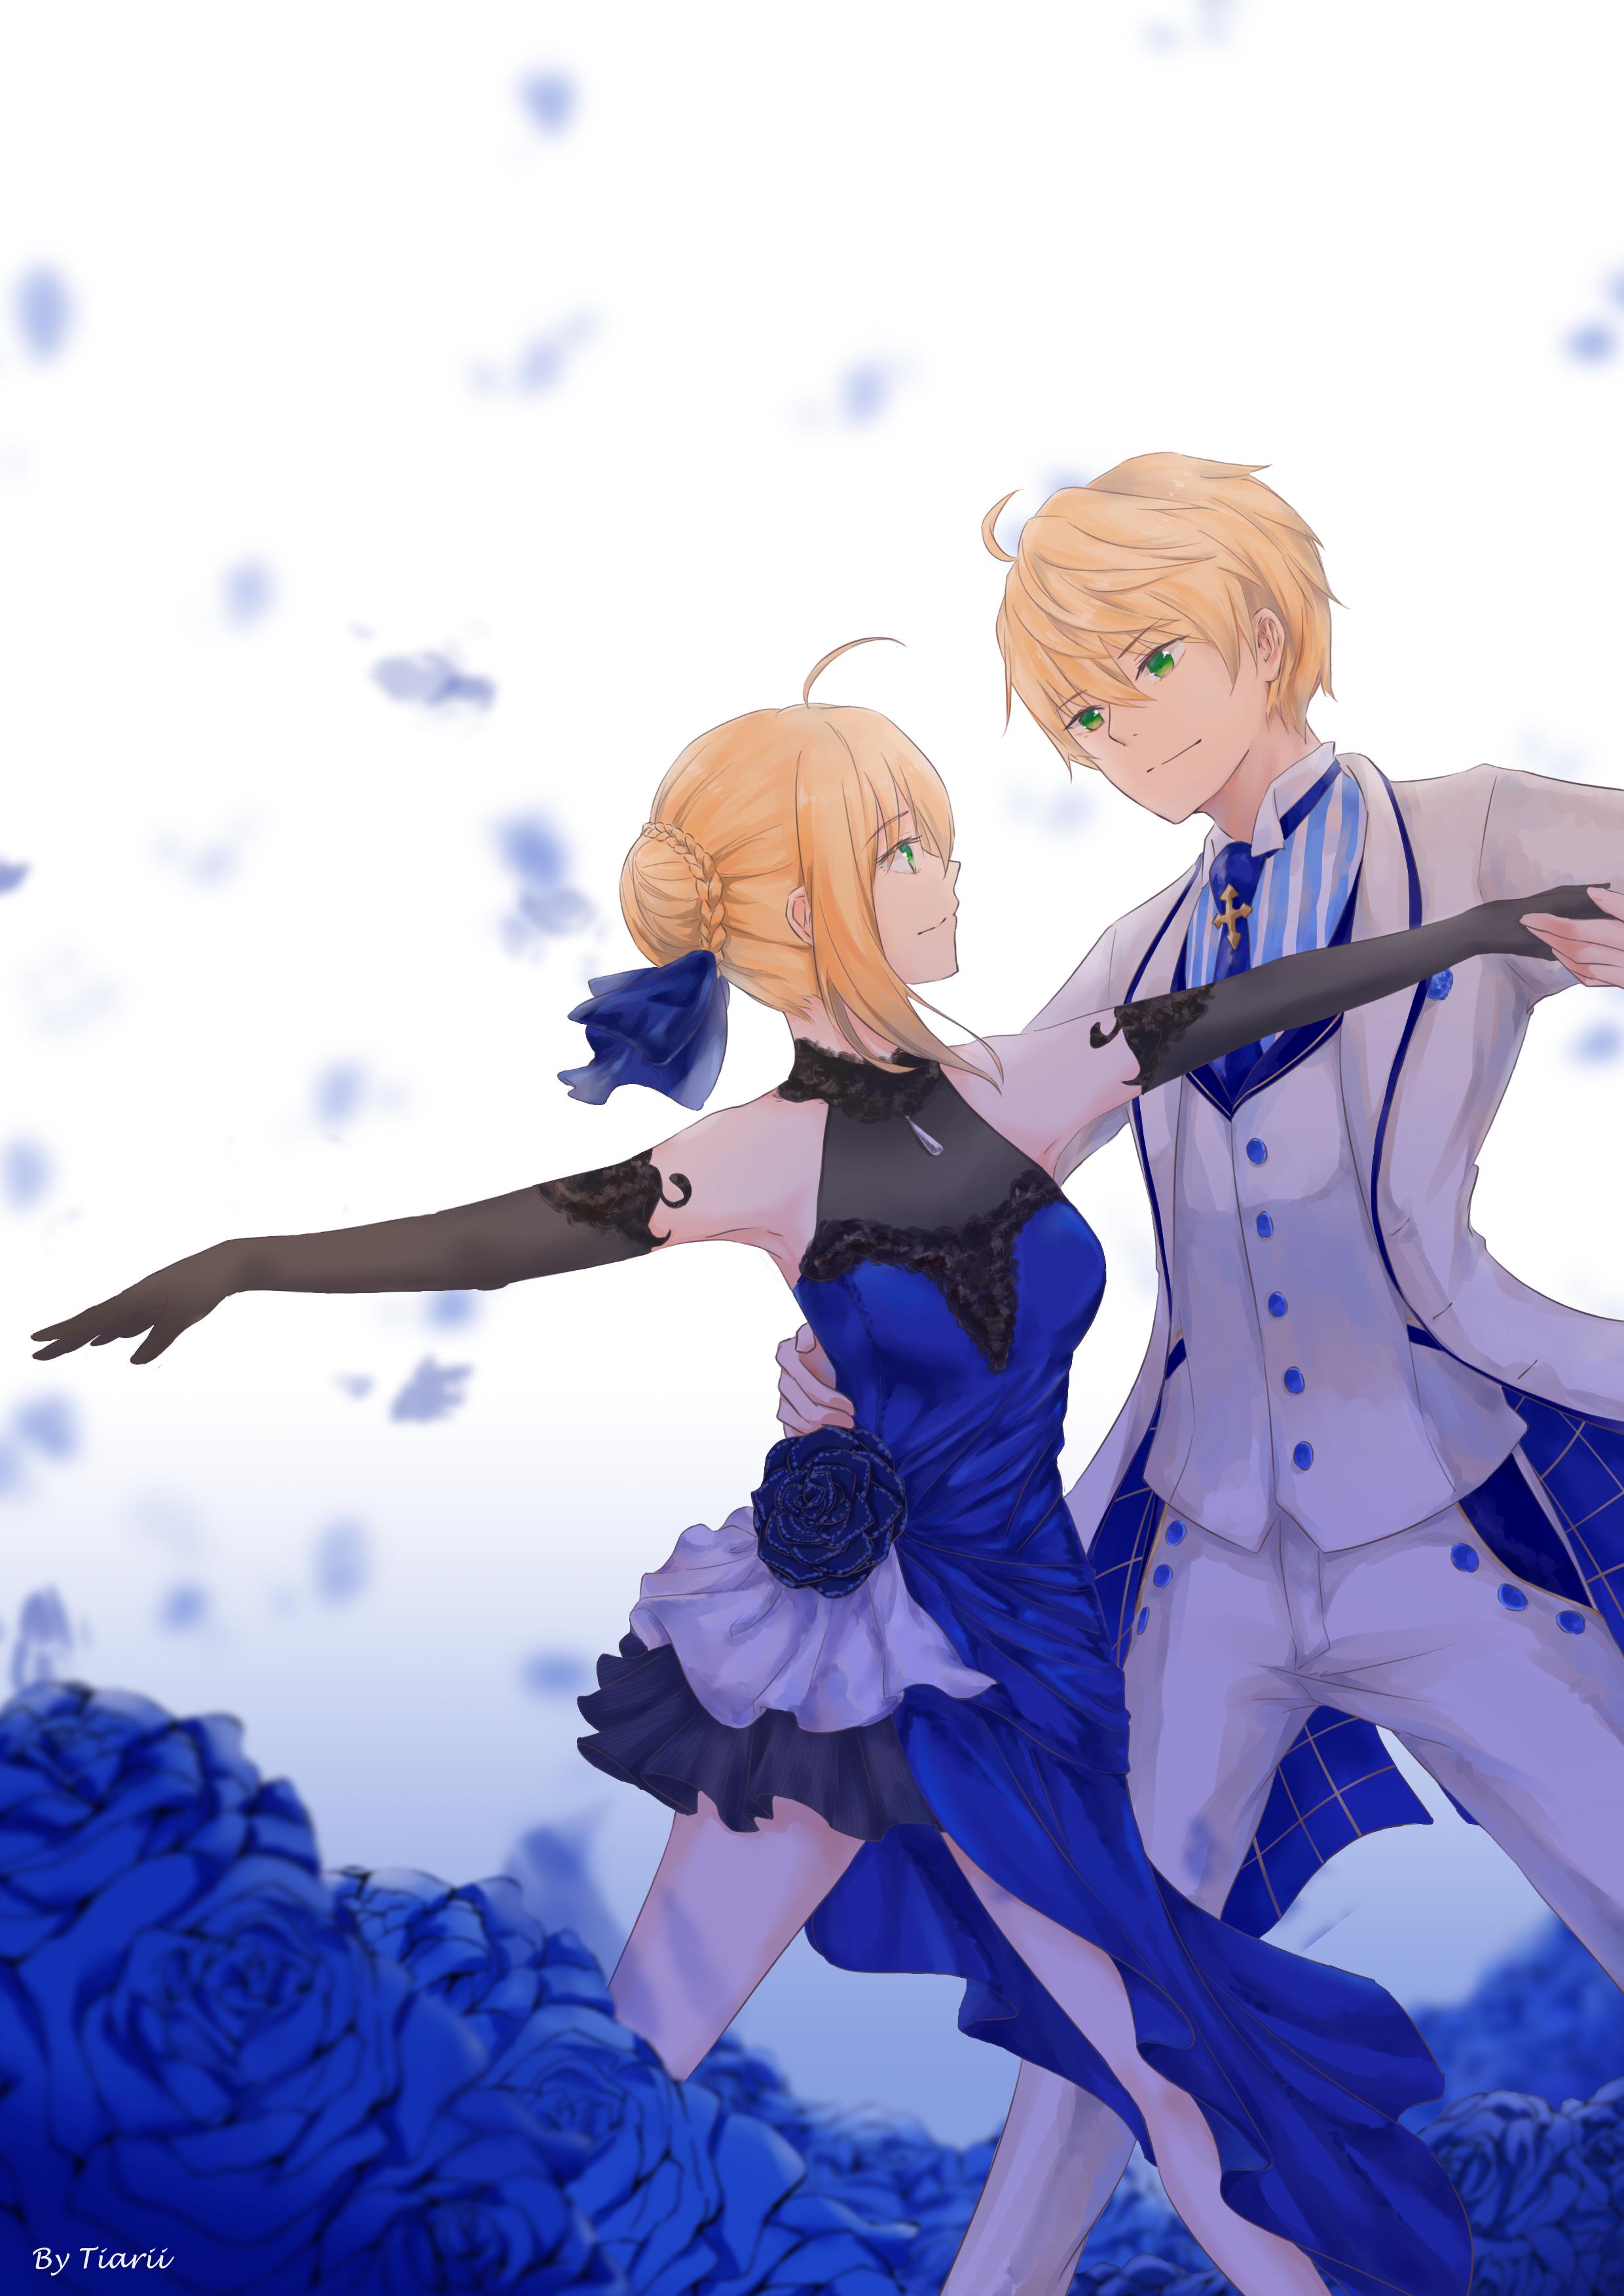 Saber Saber Male Fate Grand Order Anime Fate Anime Series Fate